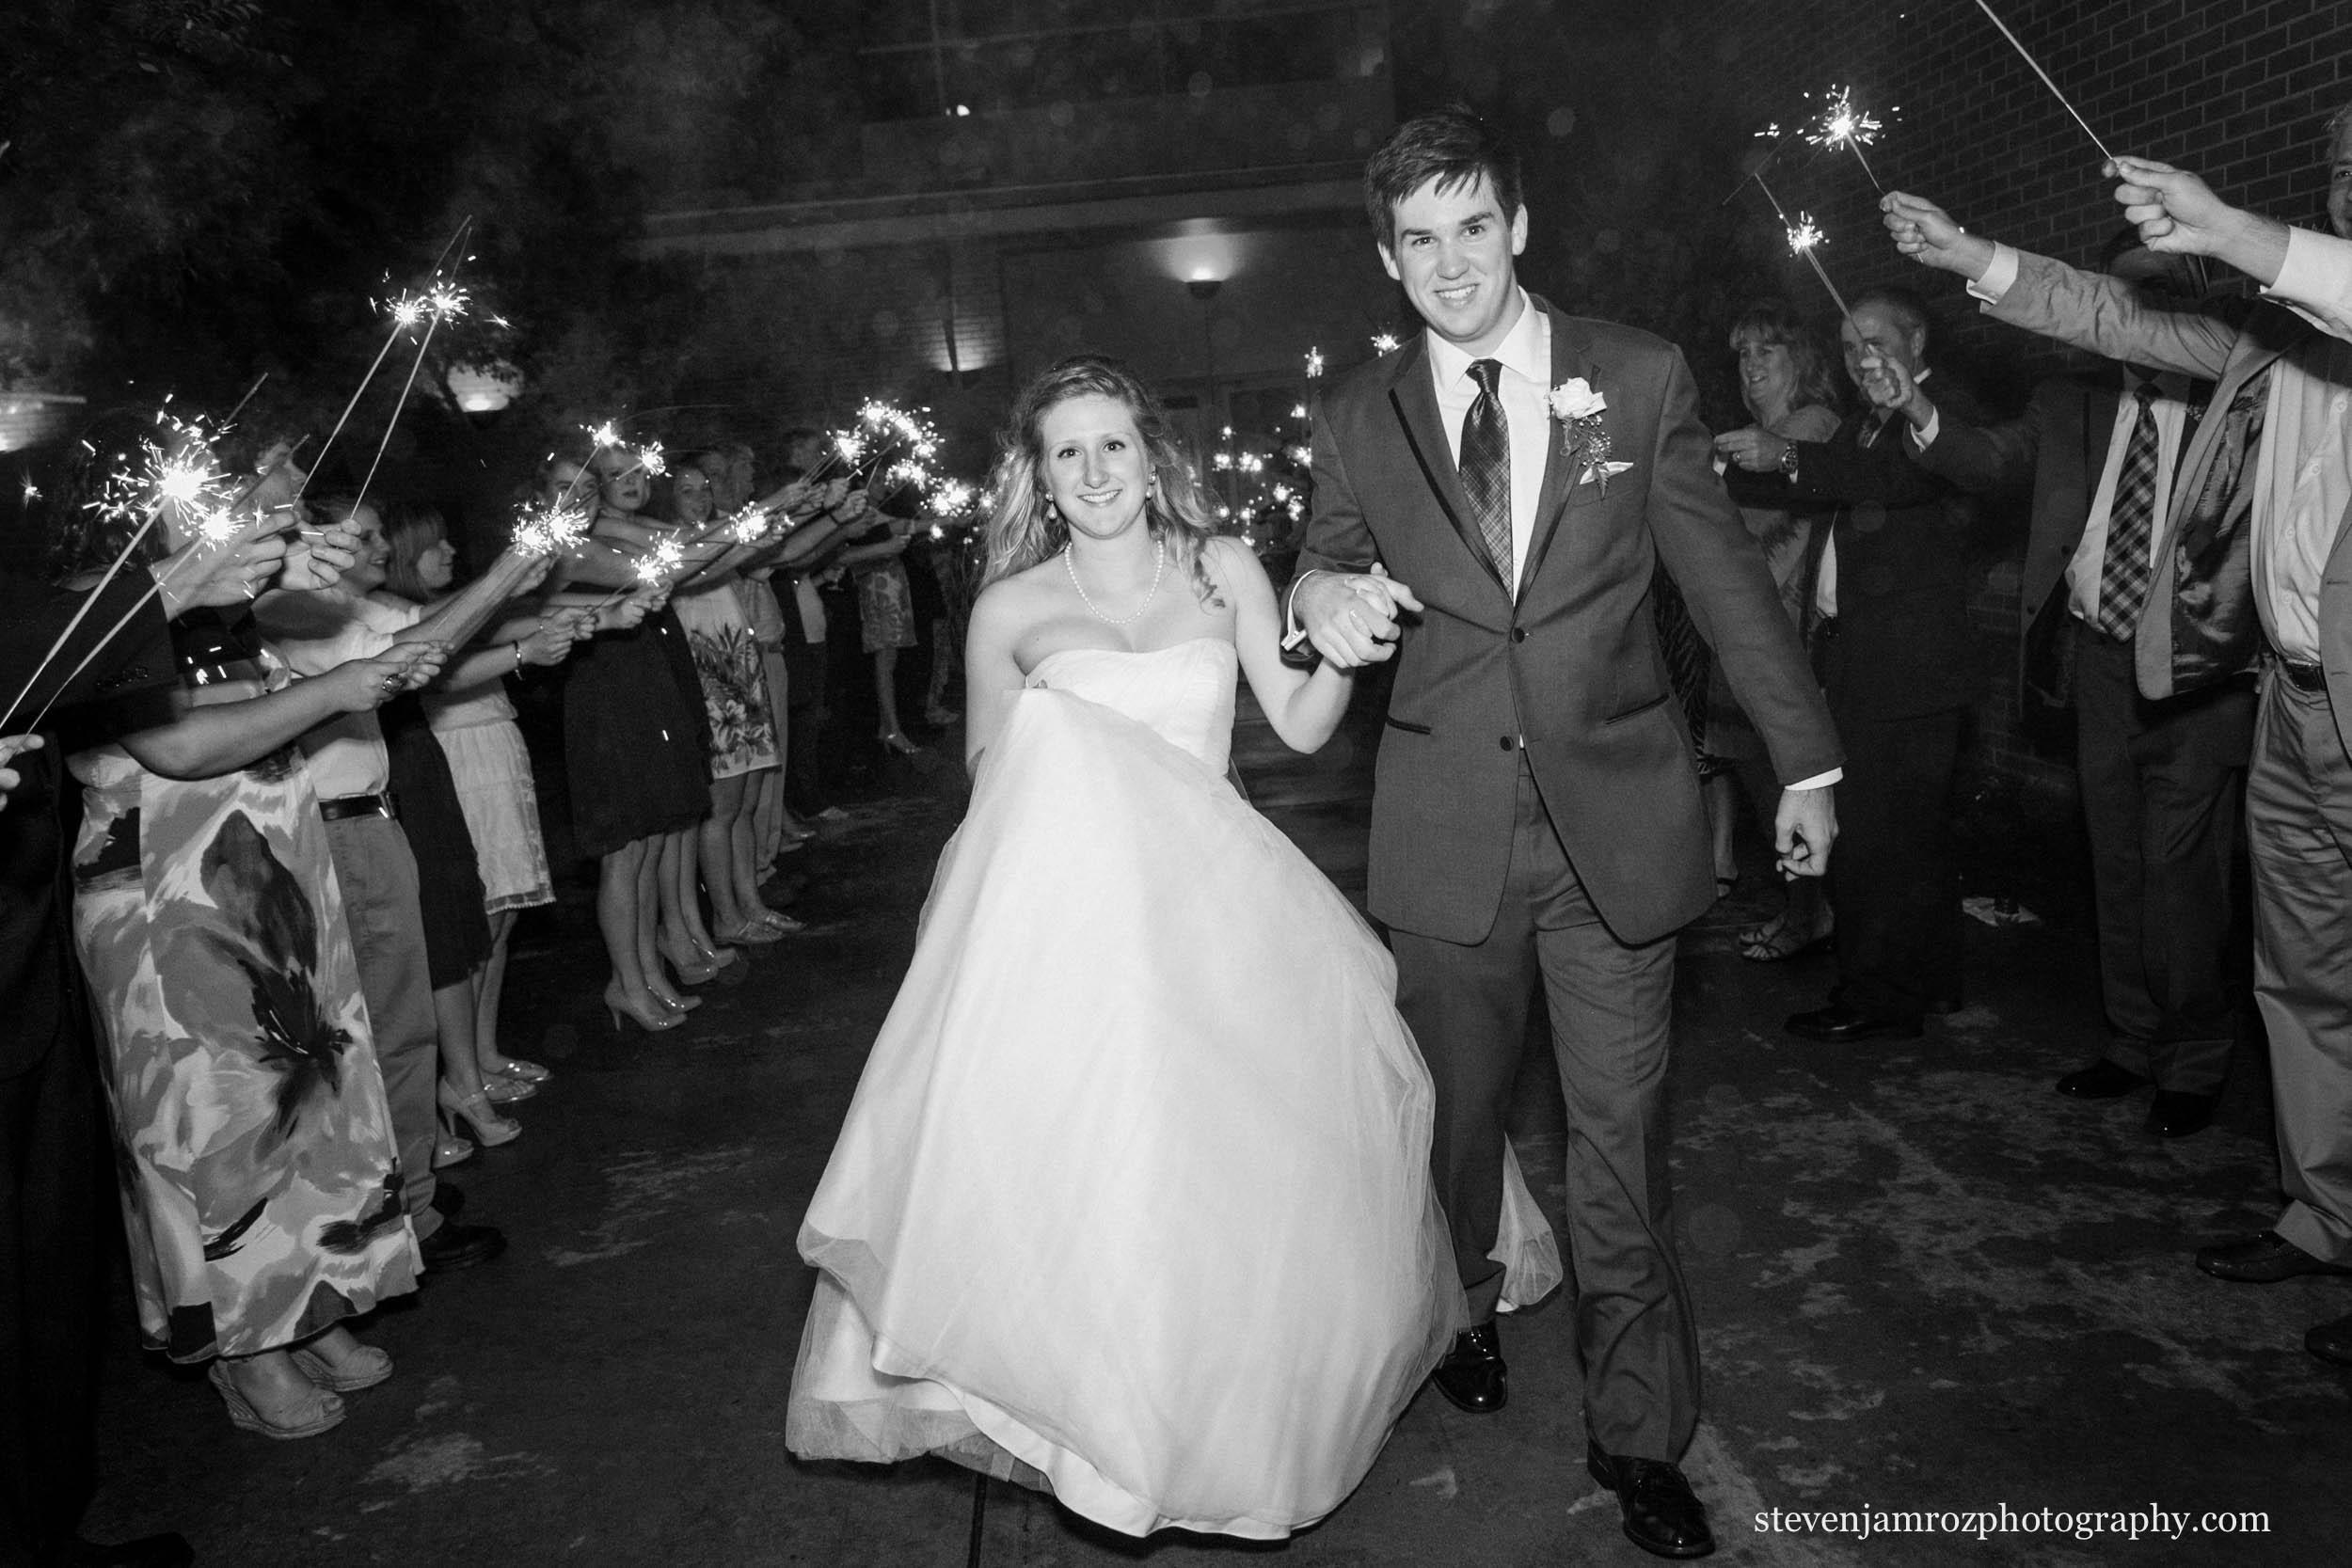 marbles-museum-wedding-raleigh-photographer-steven-jamroz-0658.jpg